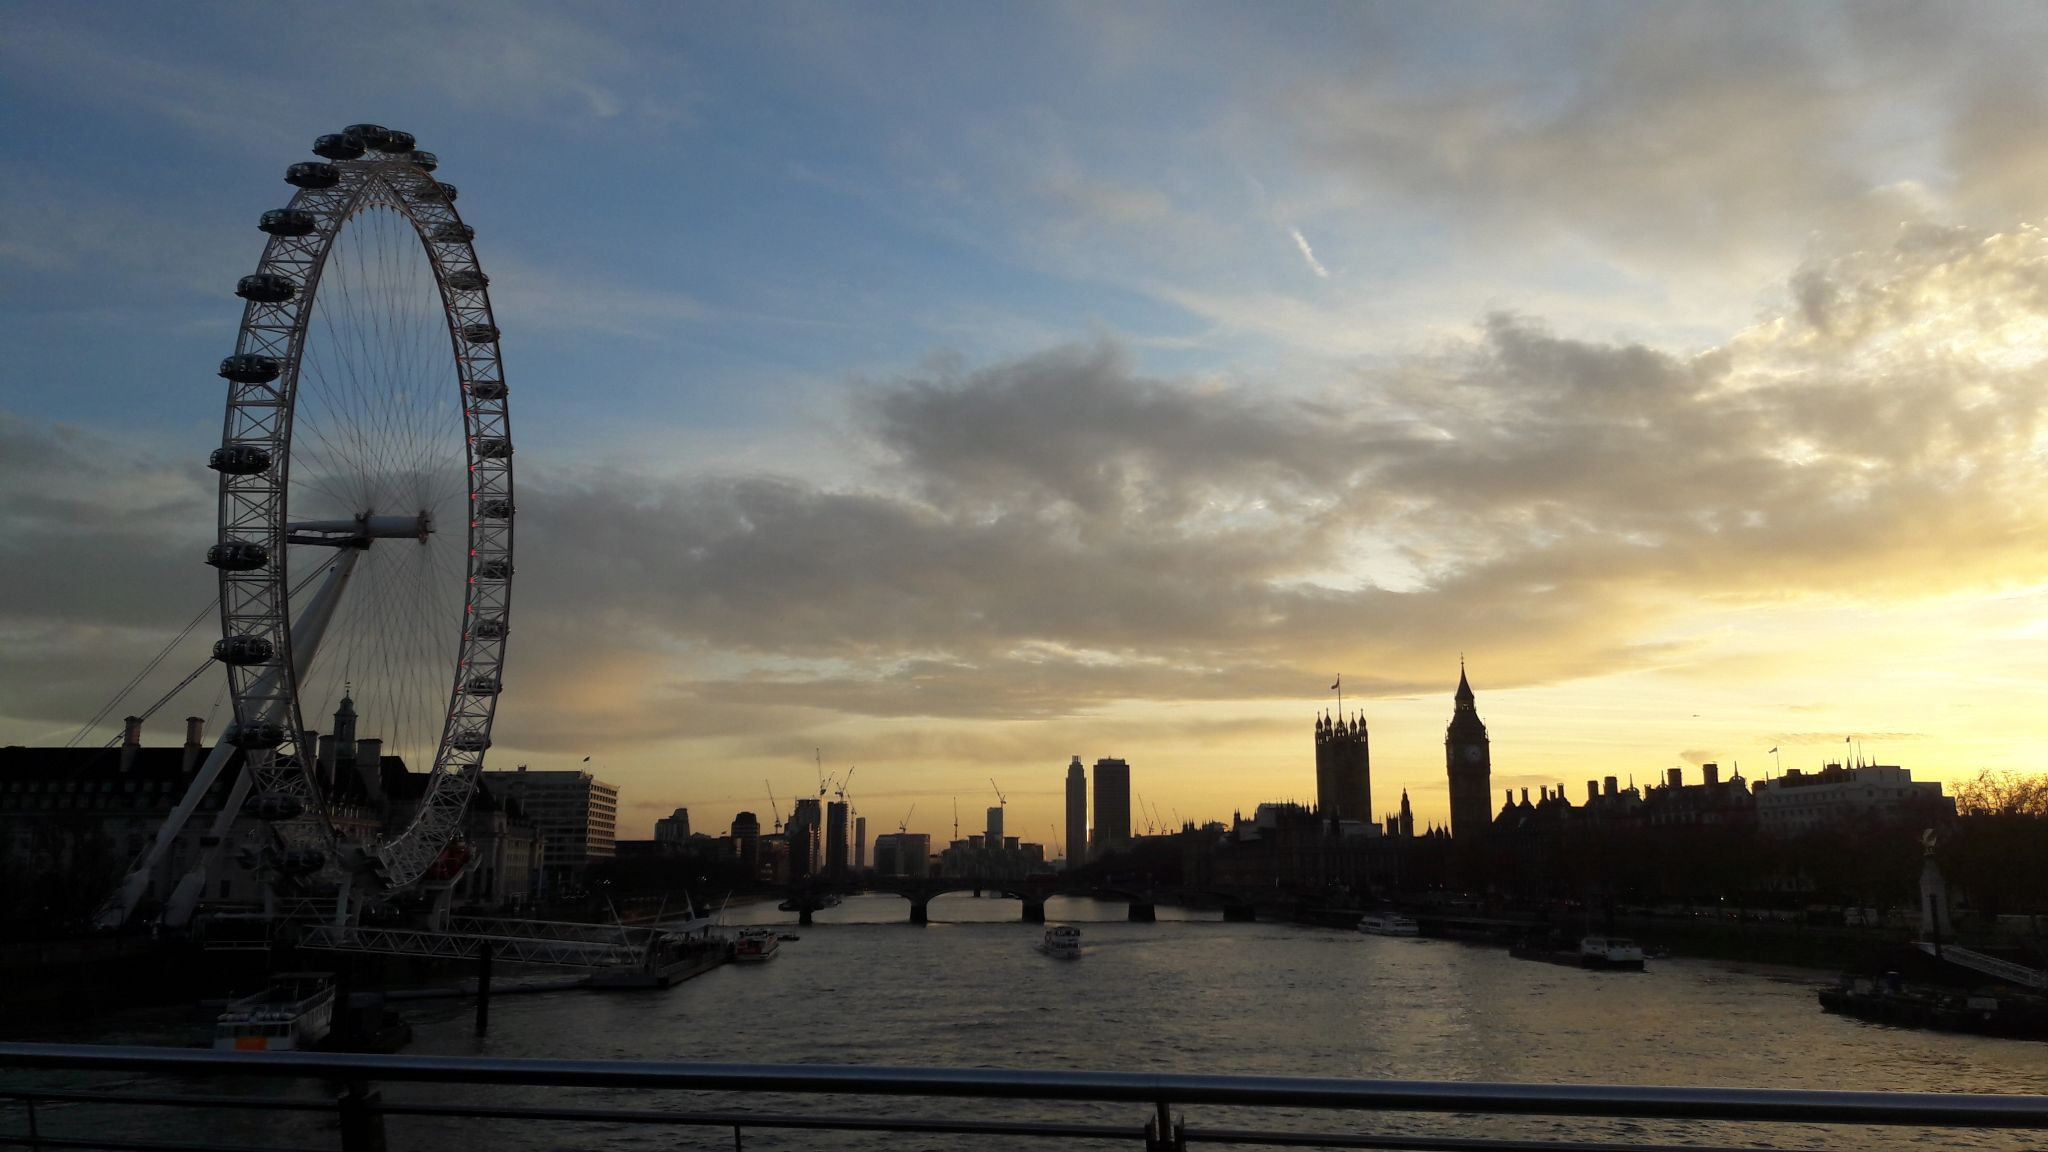 Central London, United Kingdom